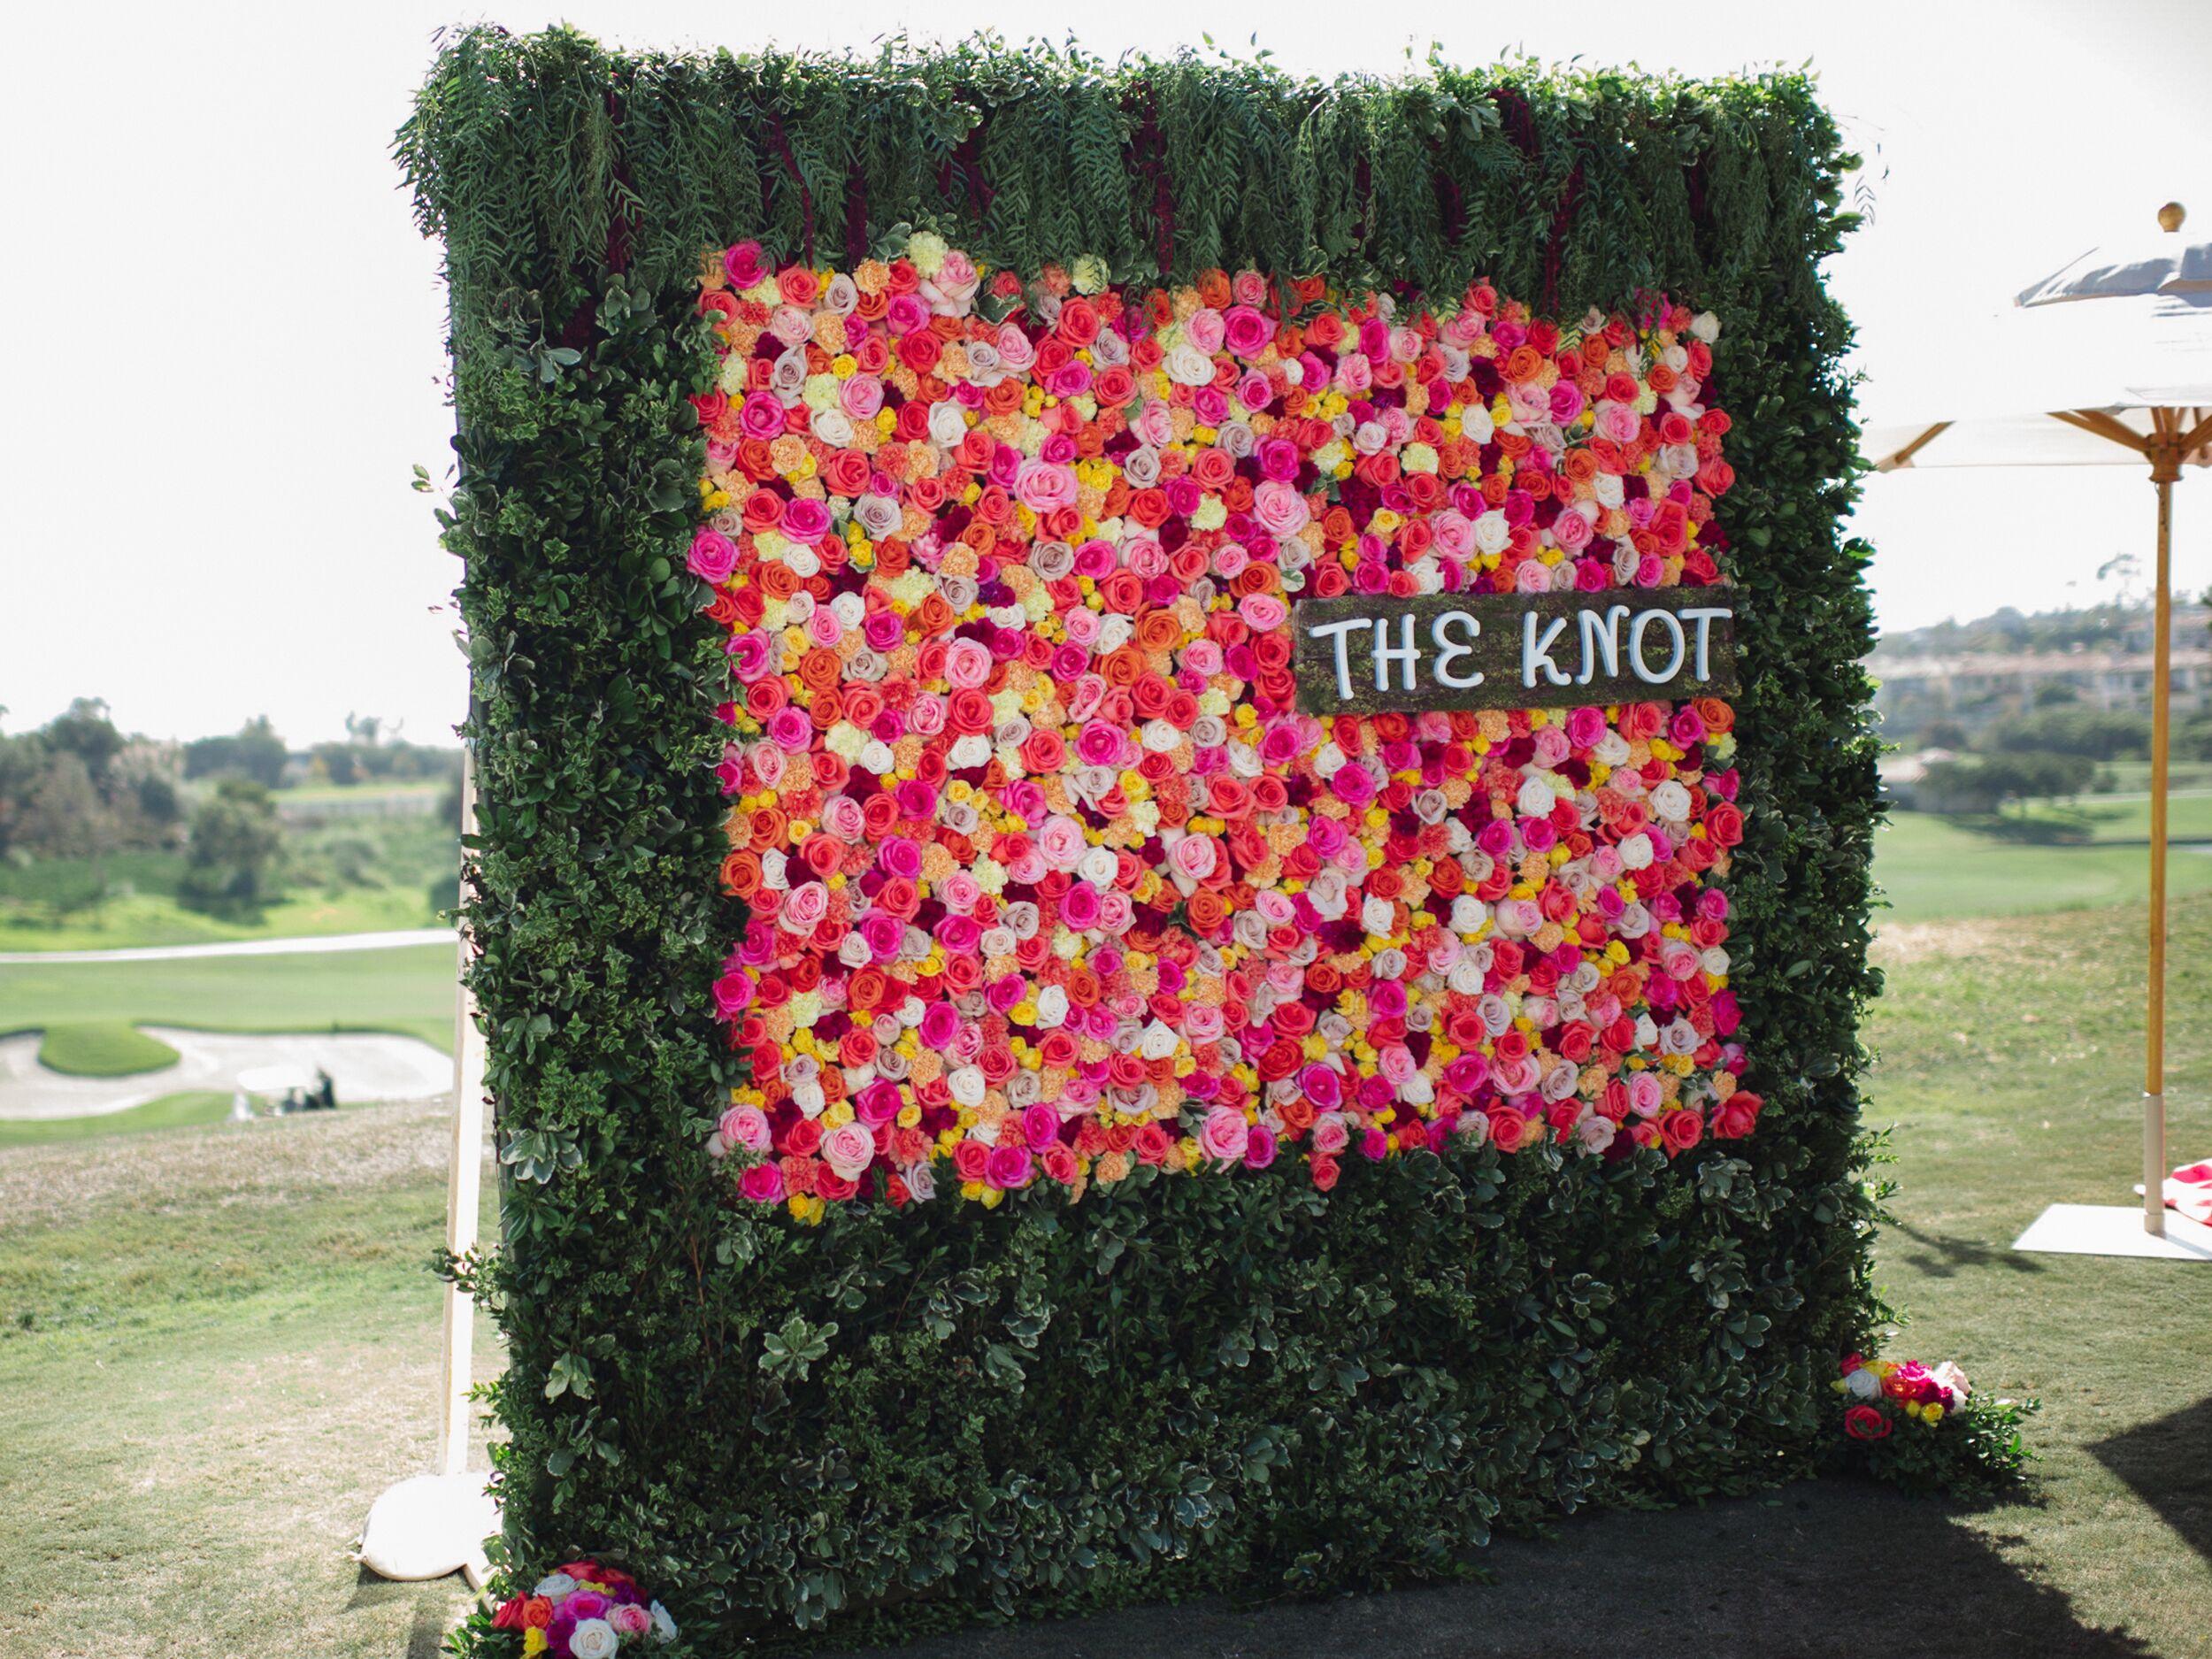 Garden-Chic Wedding Inspiration From Orange County